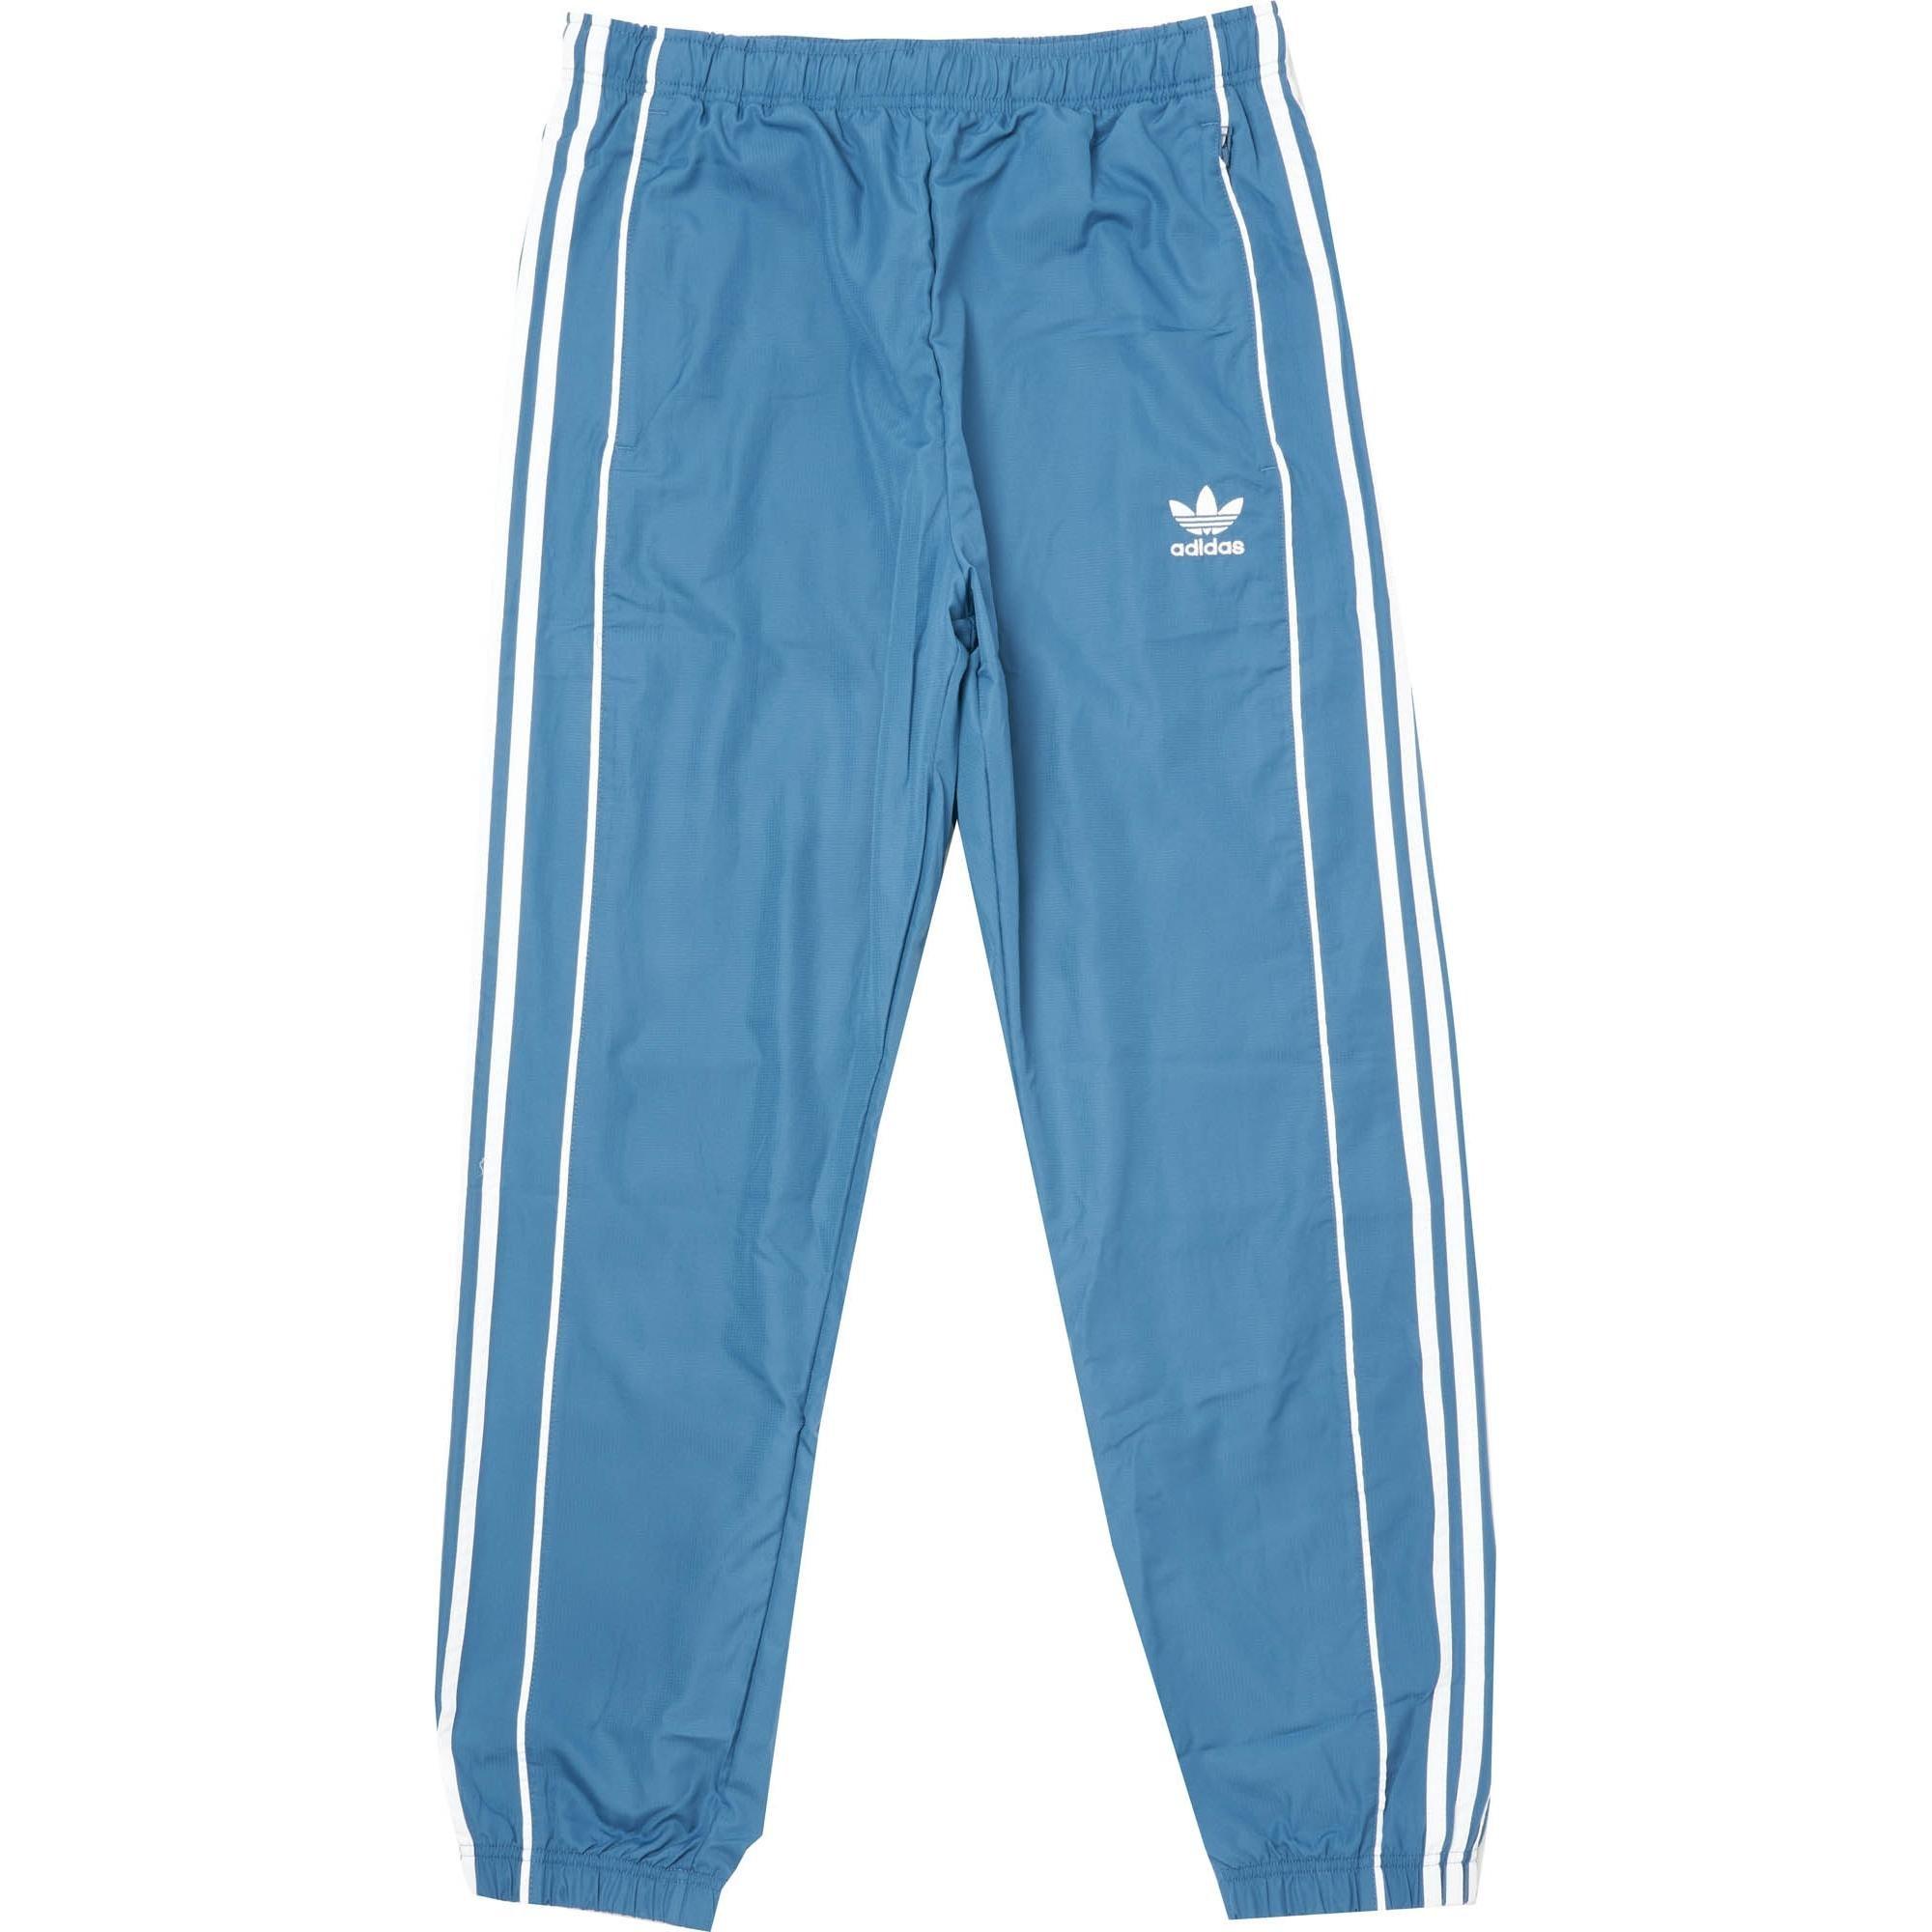 Adidas Originals Blue Authentic Wind Track Pants